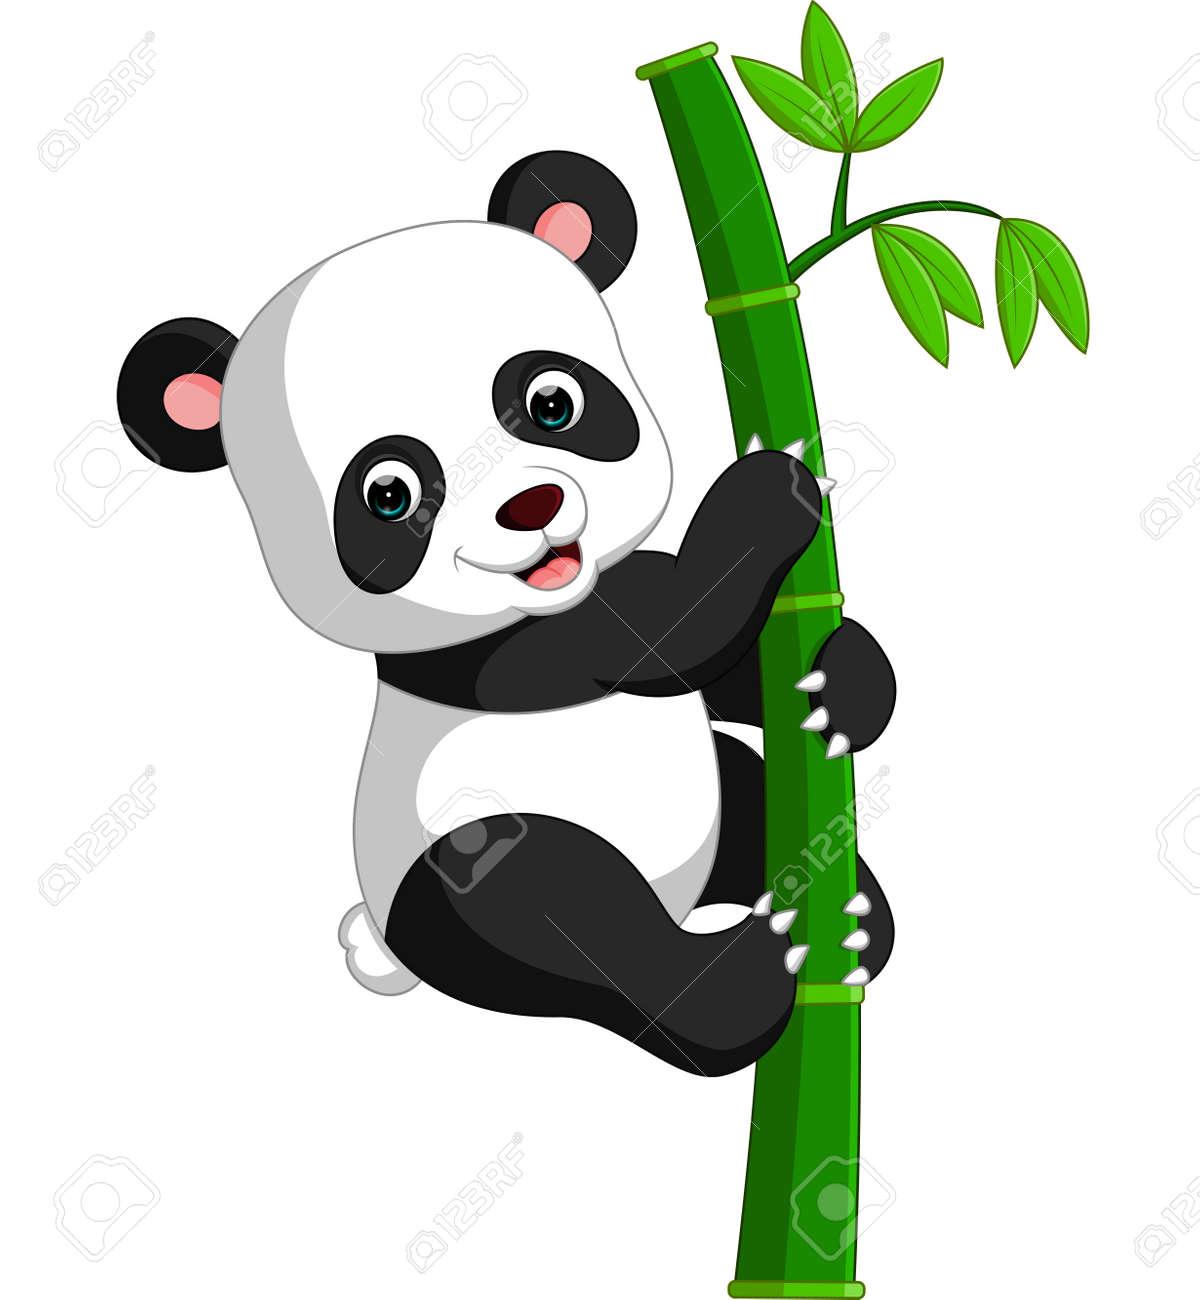 Mignon Dessin Animé Panda